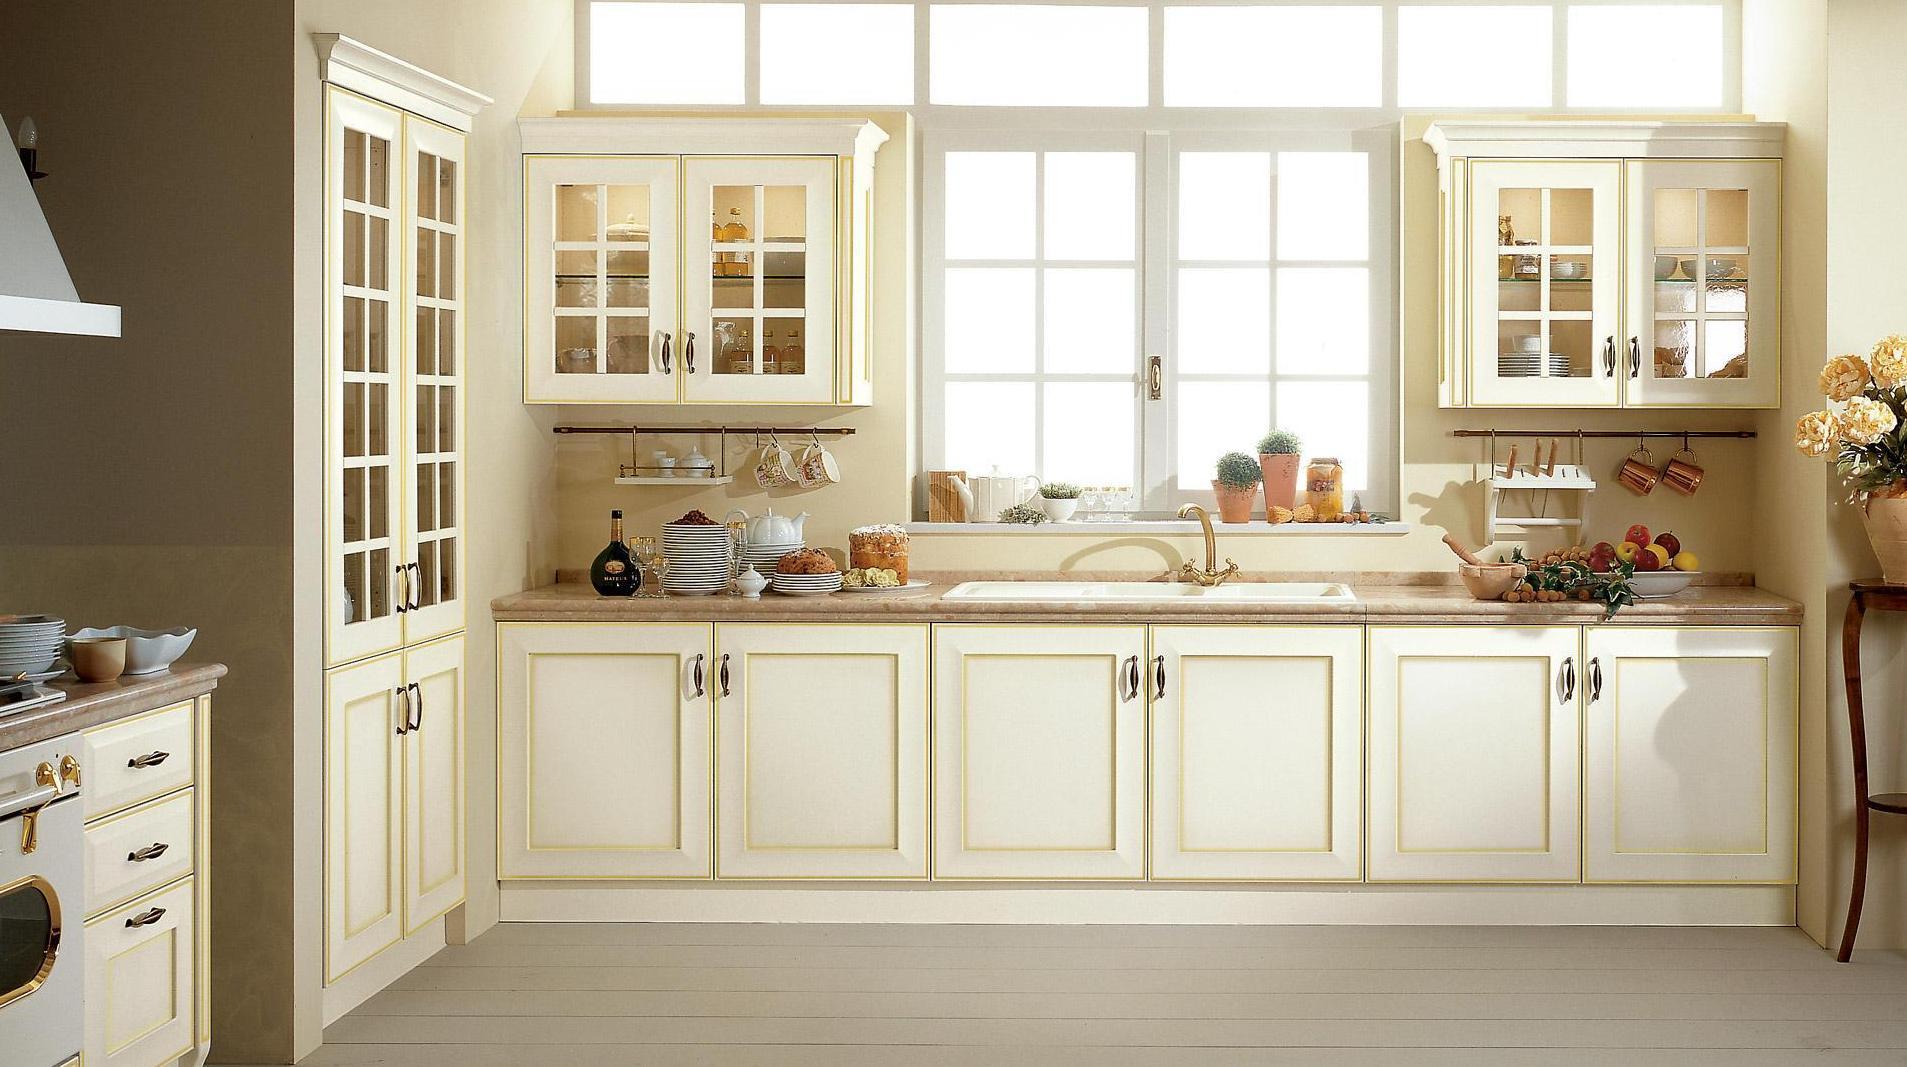 Cocinas cl sicas cocinas y ba os de cocinas y ba os snello for Cocinas clasicas